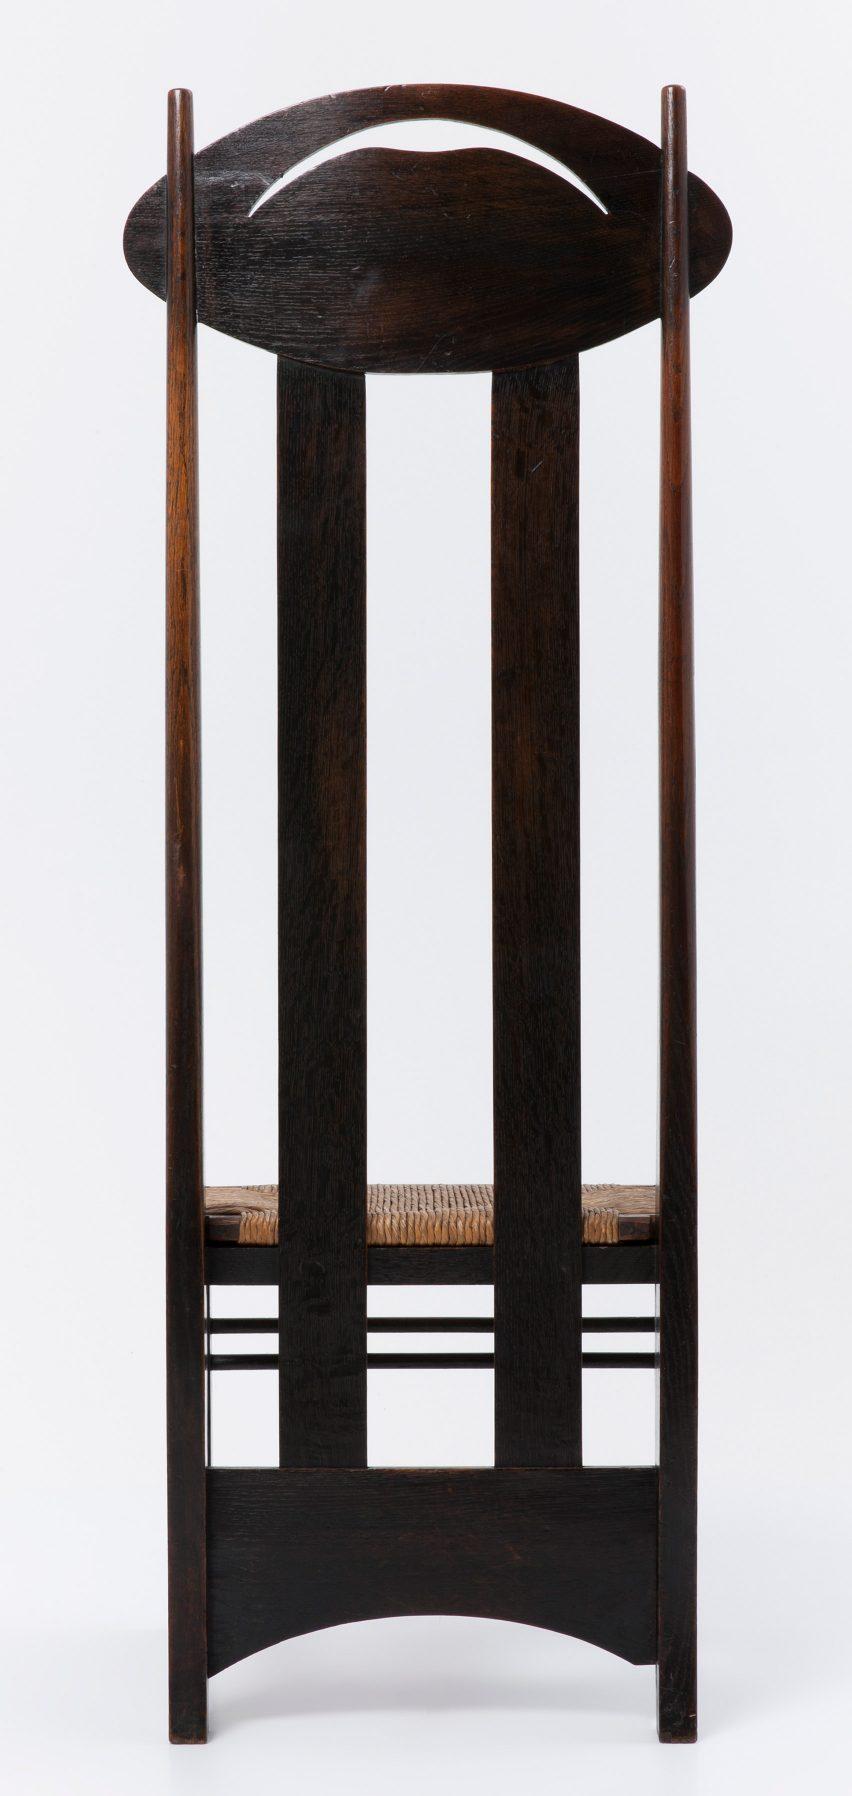 charles rennie mackintosh willow chair round lounge s argyle was designed to create by